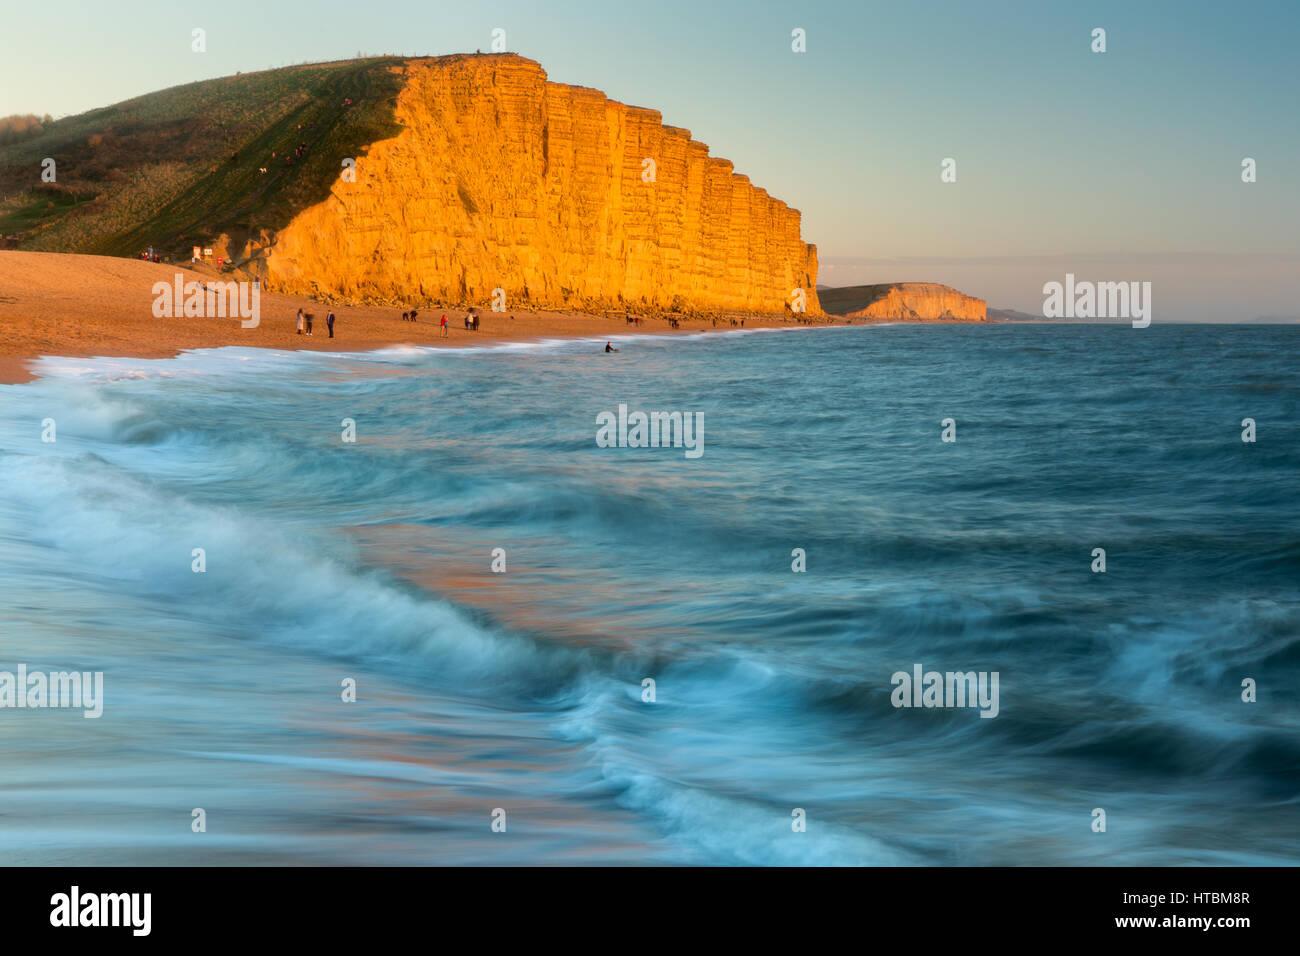 The beach below East Cliff, West Bay, Jurassic Coast, Dorset, England, UK Stock Photo